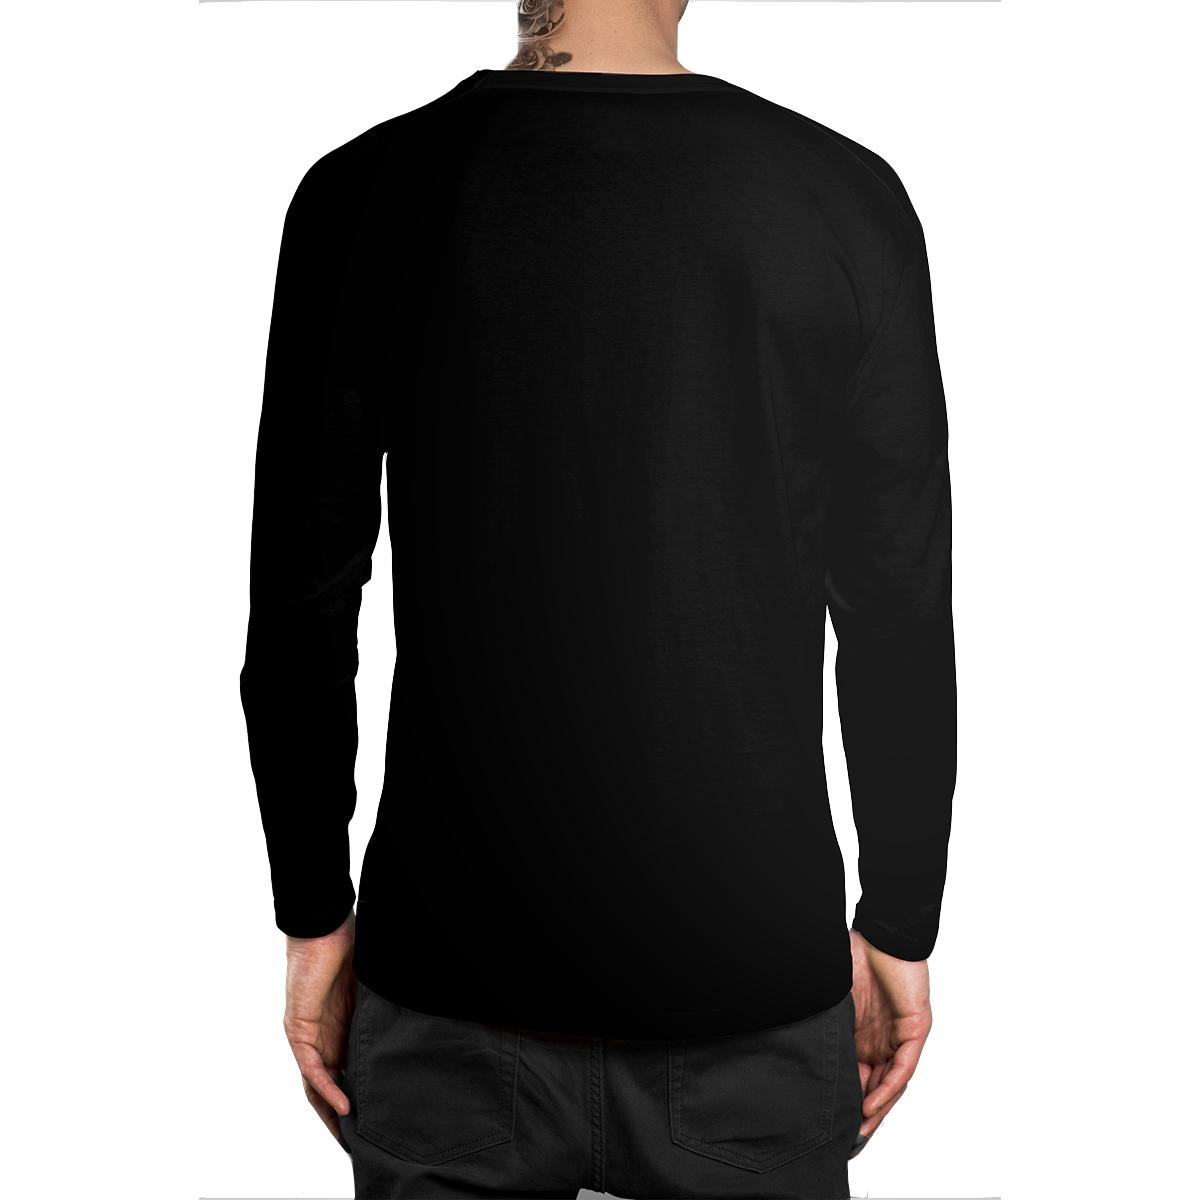 Stompy Camiseta Manga Longa Modelo 48